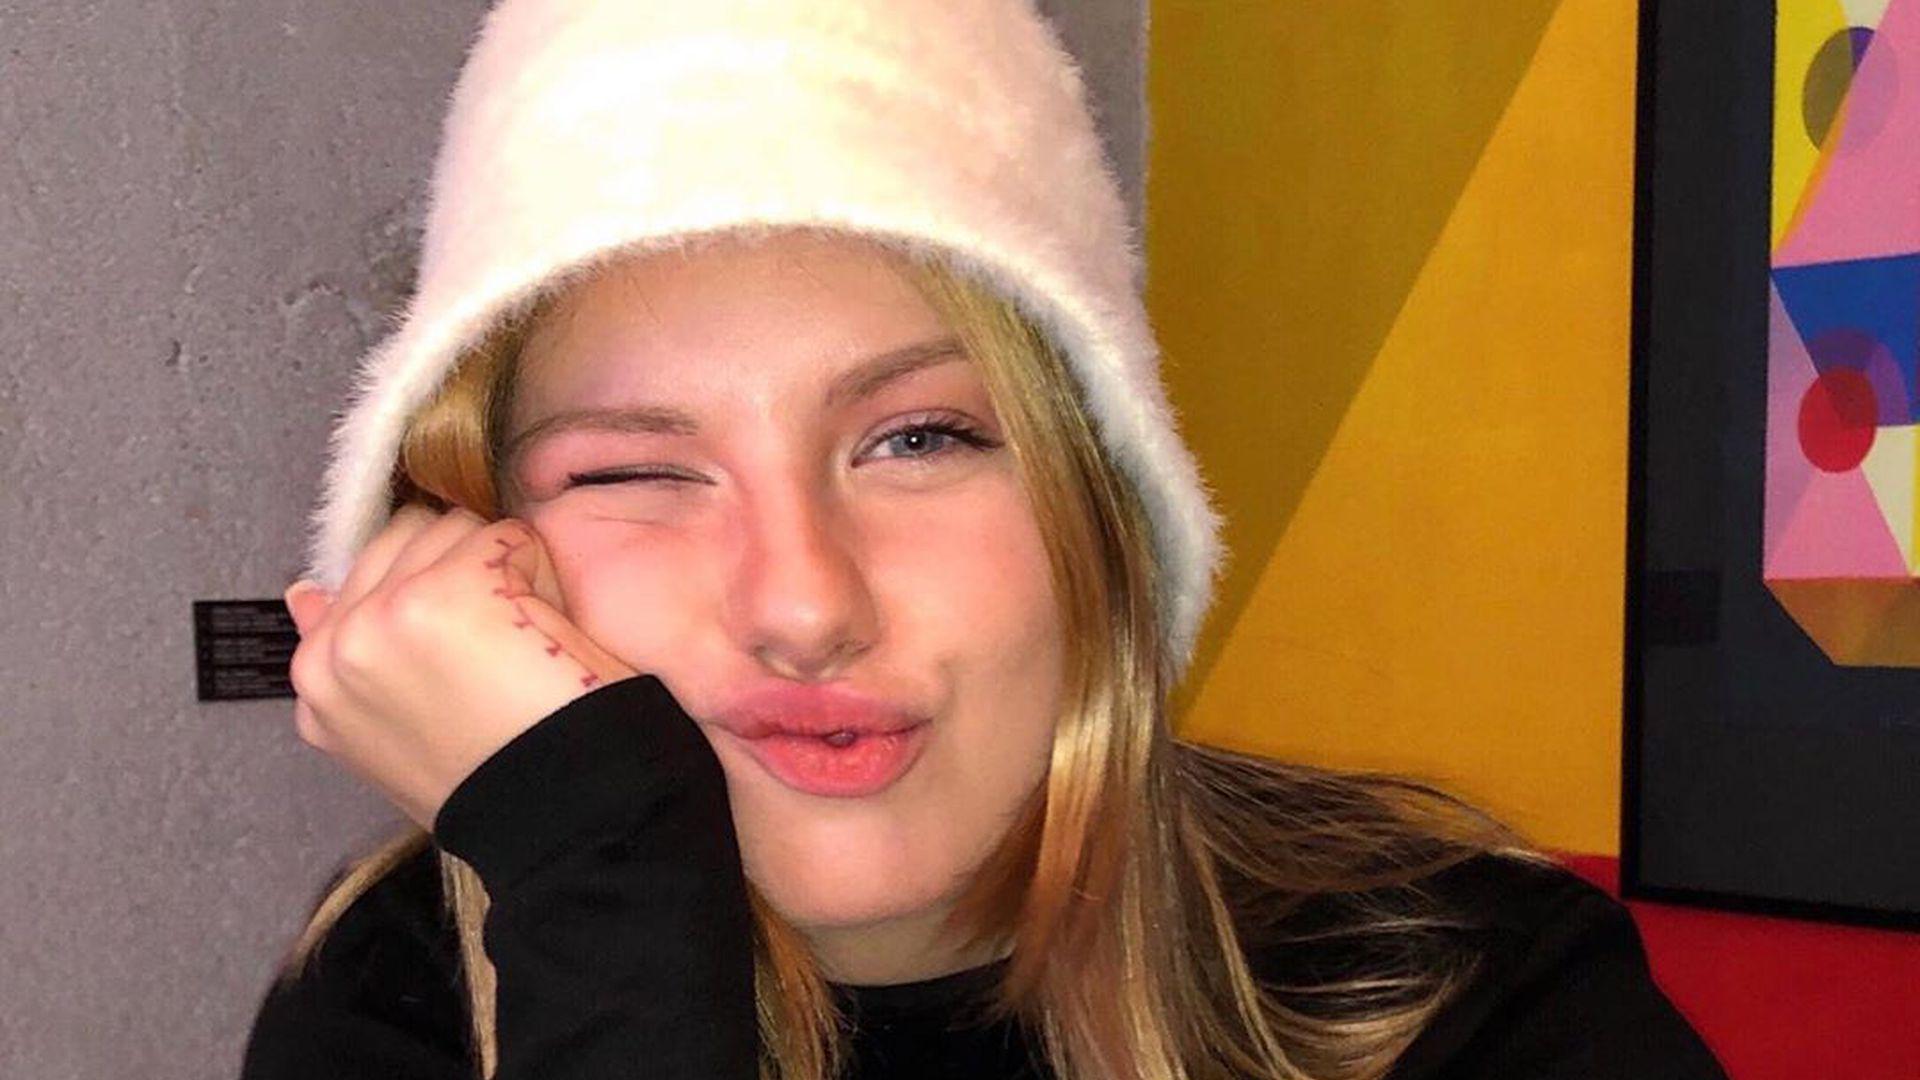 Missesvlog kelly porn aka Kelly MissesVlog